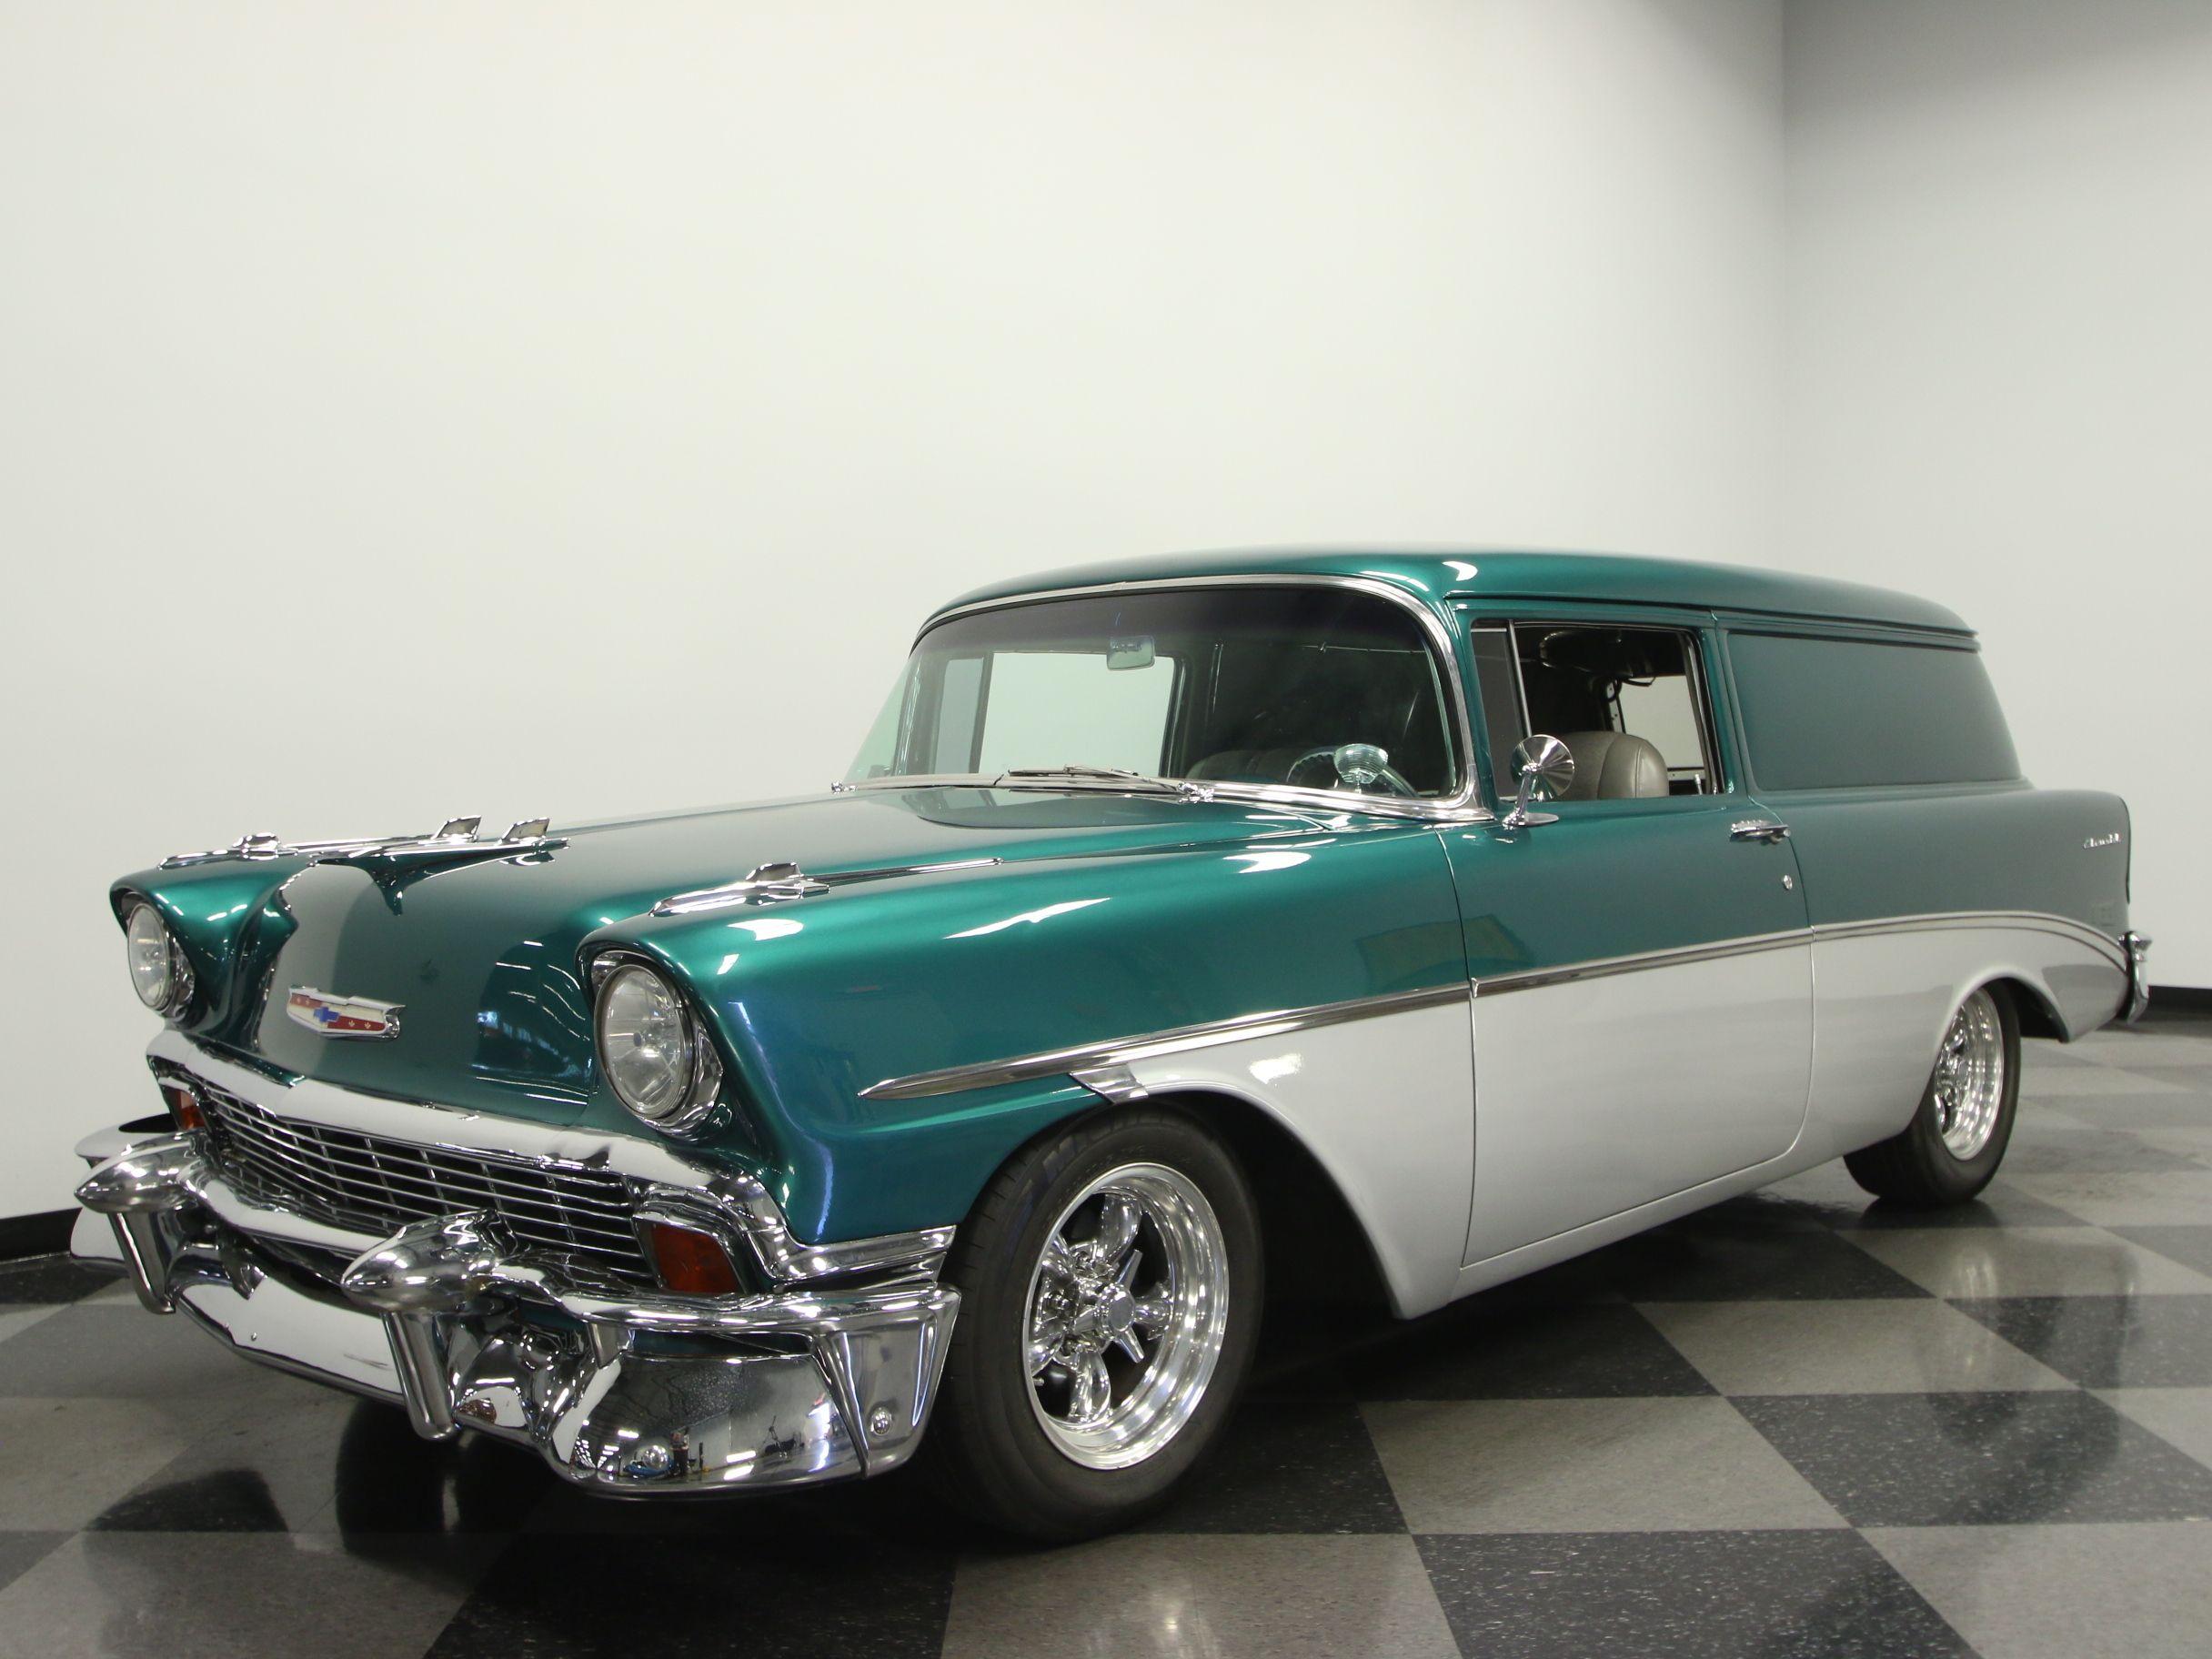 1956 Chevrolet 210 Sedan Delivery   Streetside Classics - The ...